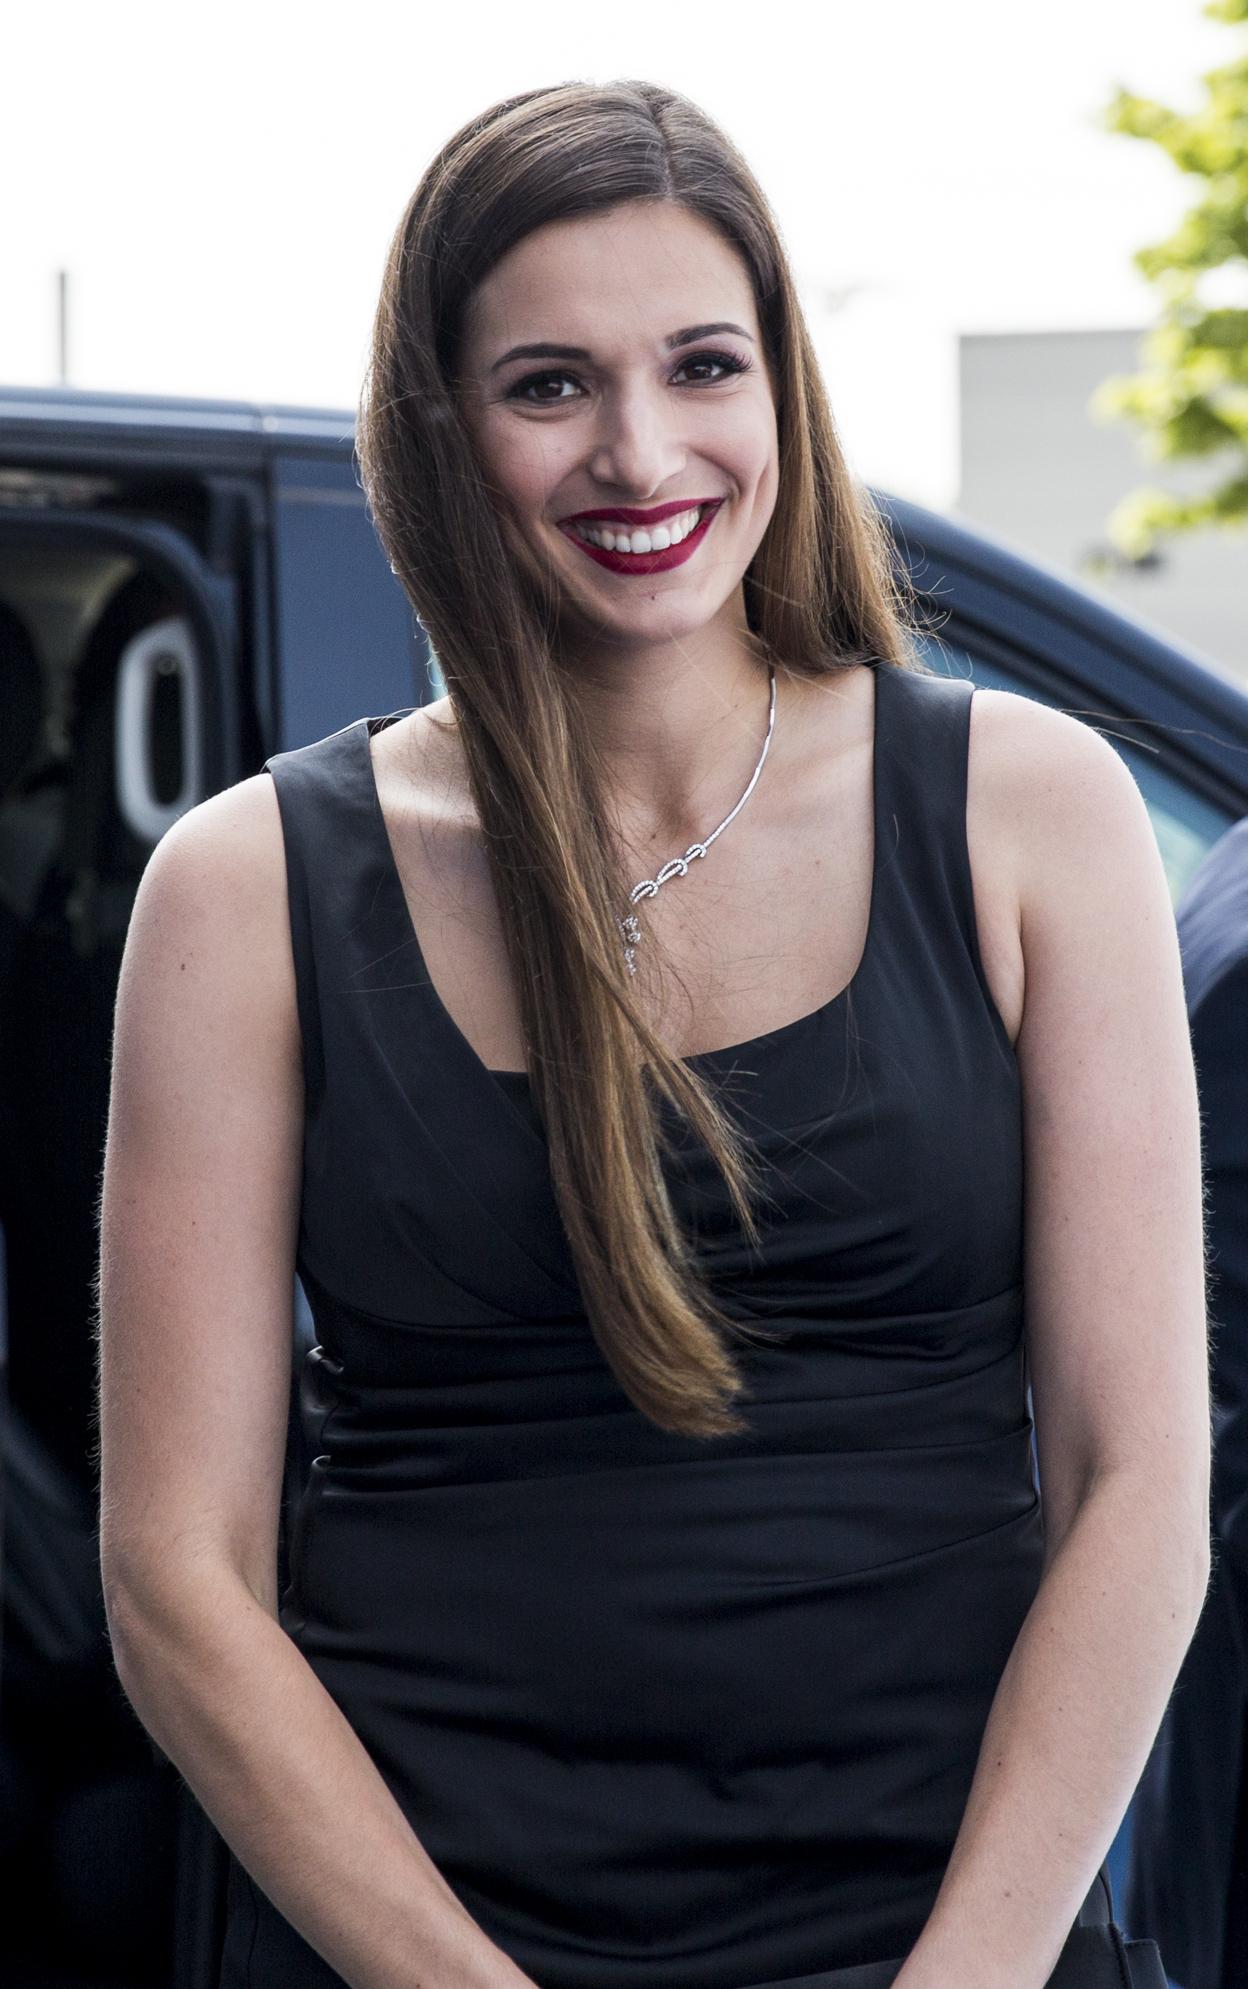 Saliha Özcan – Wikipedia